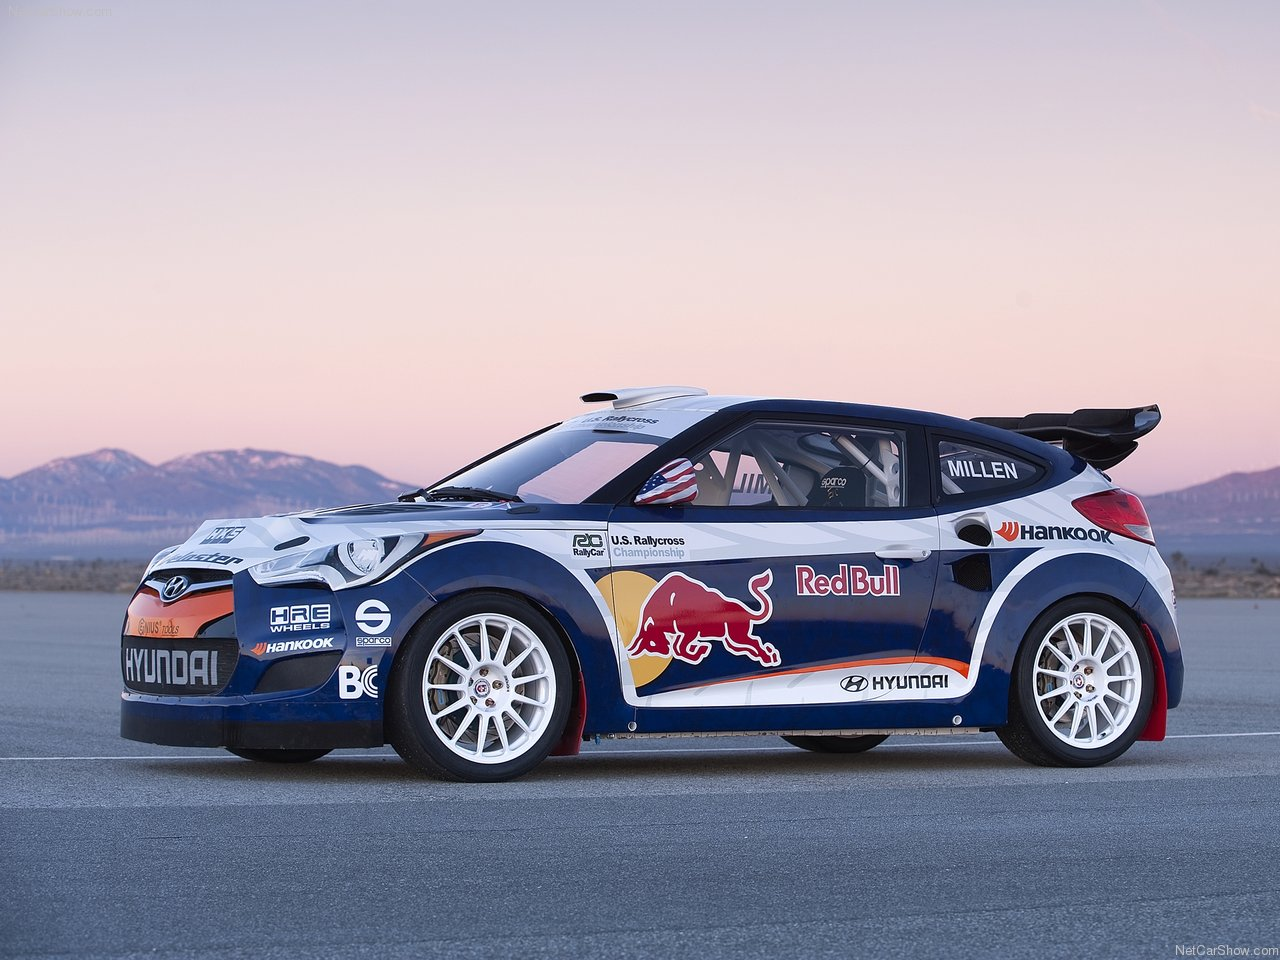 http://2.bp.blogspot.com/-tDm0KZvJ6hw/TVwqIovVTtI/AAAAAAAAD6g/53PTMpOzfRk/s1600/Hyundai-Veloster_Rally_Car_2011_1280x960_wallpaper_01.jpg